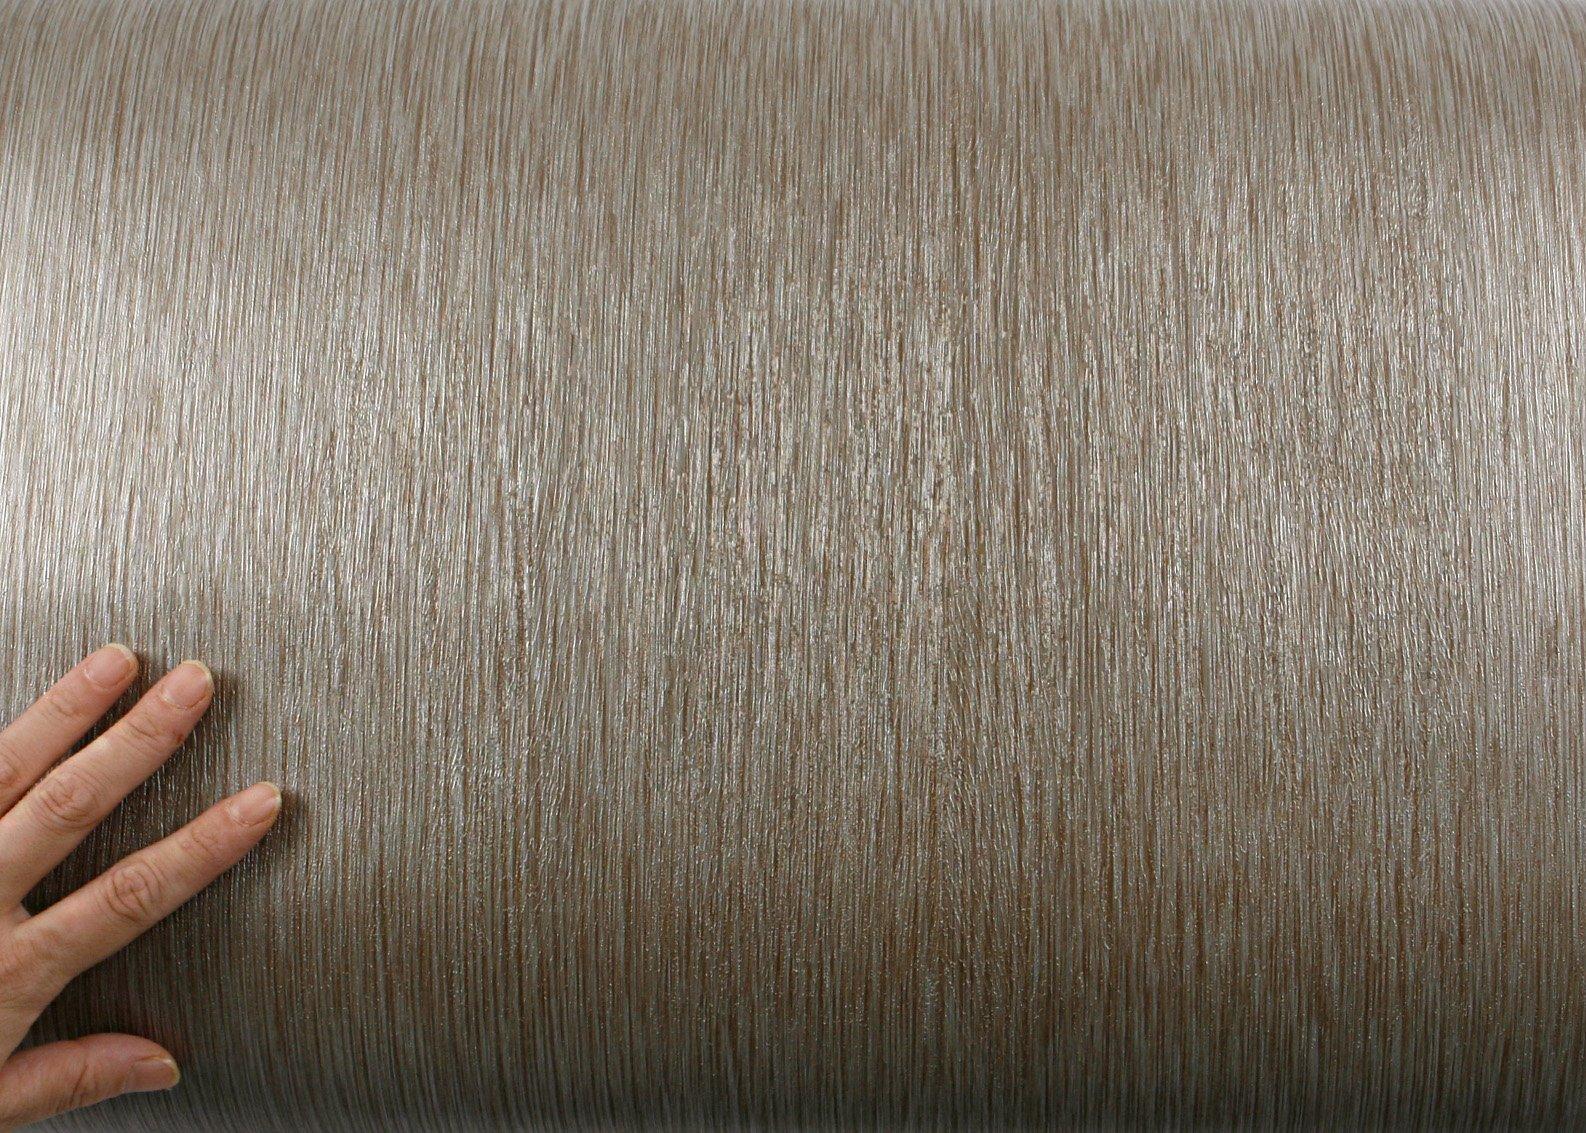 ROSEROSA Peel & Stick Backsplash Luxury Embossed Wood Contact Paper Self-adhesive Wallpaper Shelf Liner Table Door Reform (MG242 : 2.00 Feet X 6.56 Feet) by ROSEROSA (Image #3)